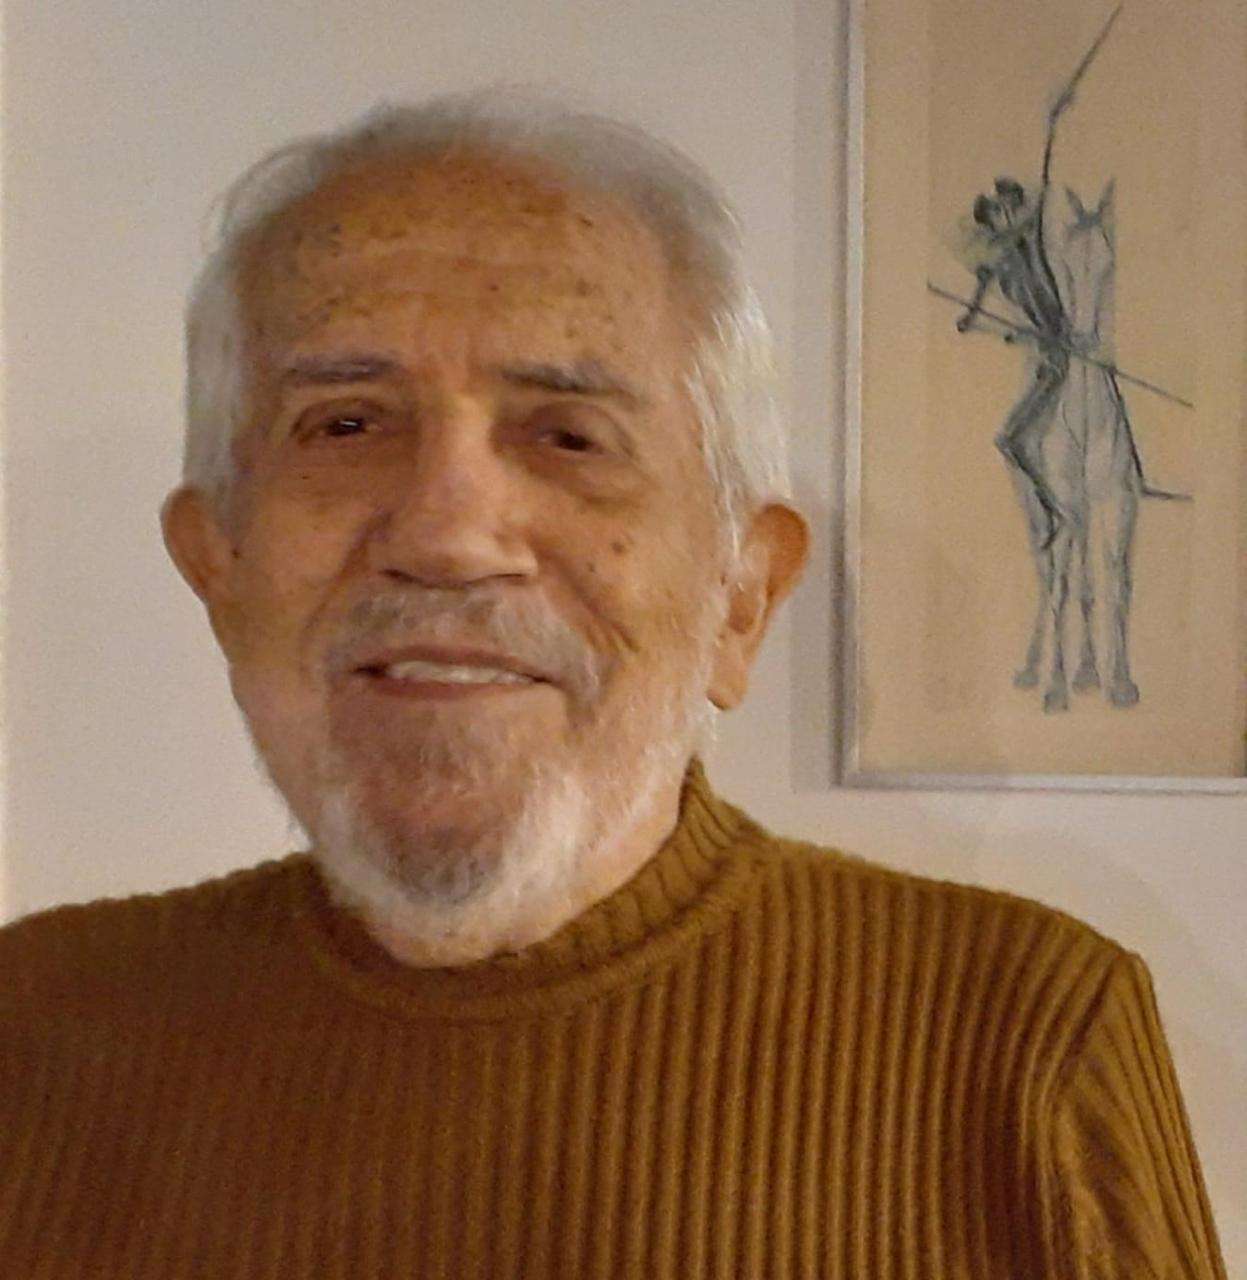 A Luiz Alberto Gomes